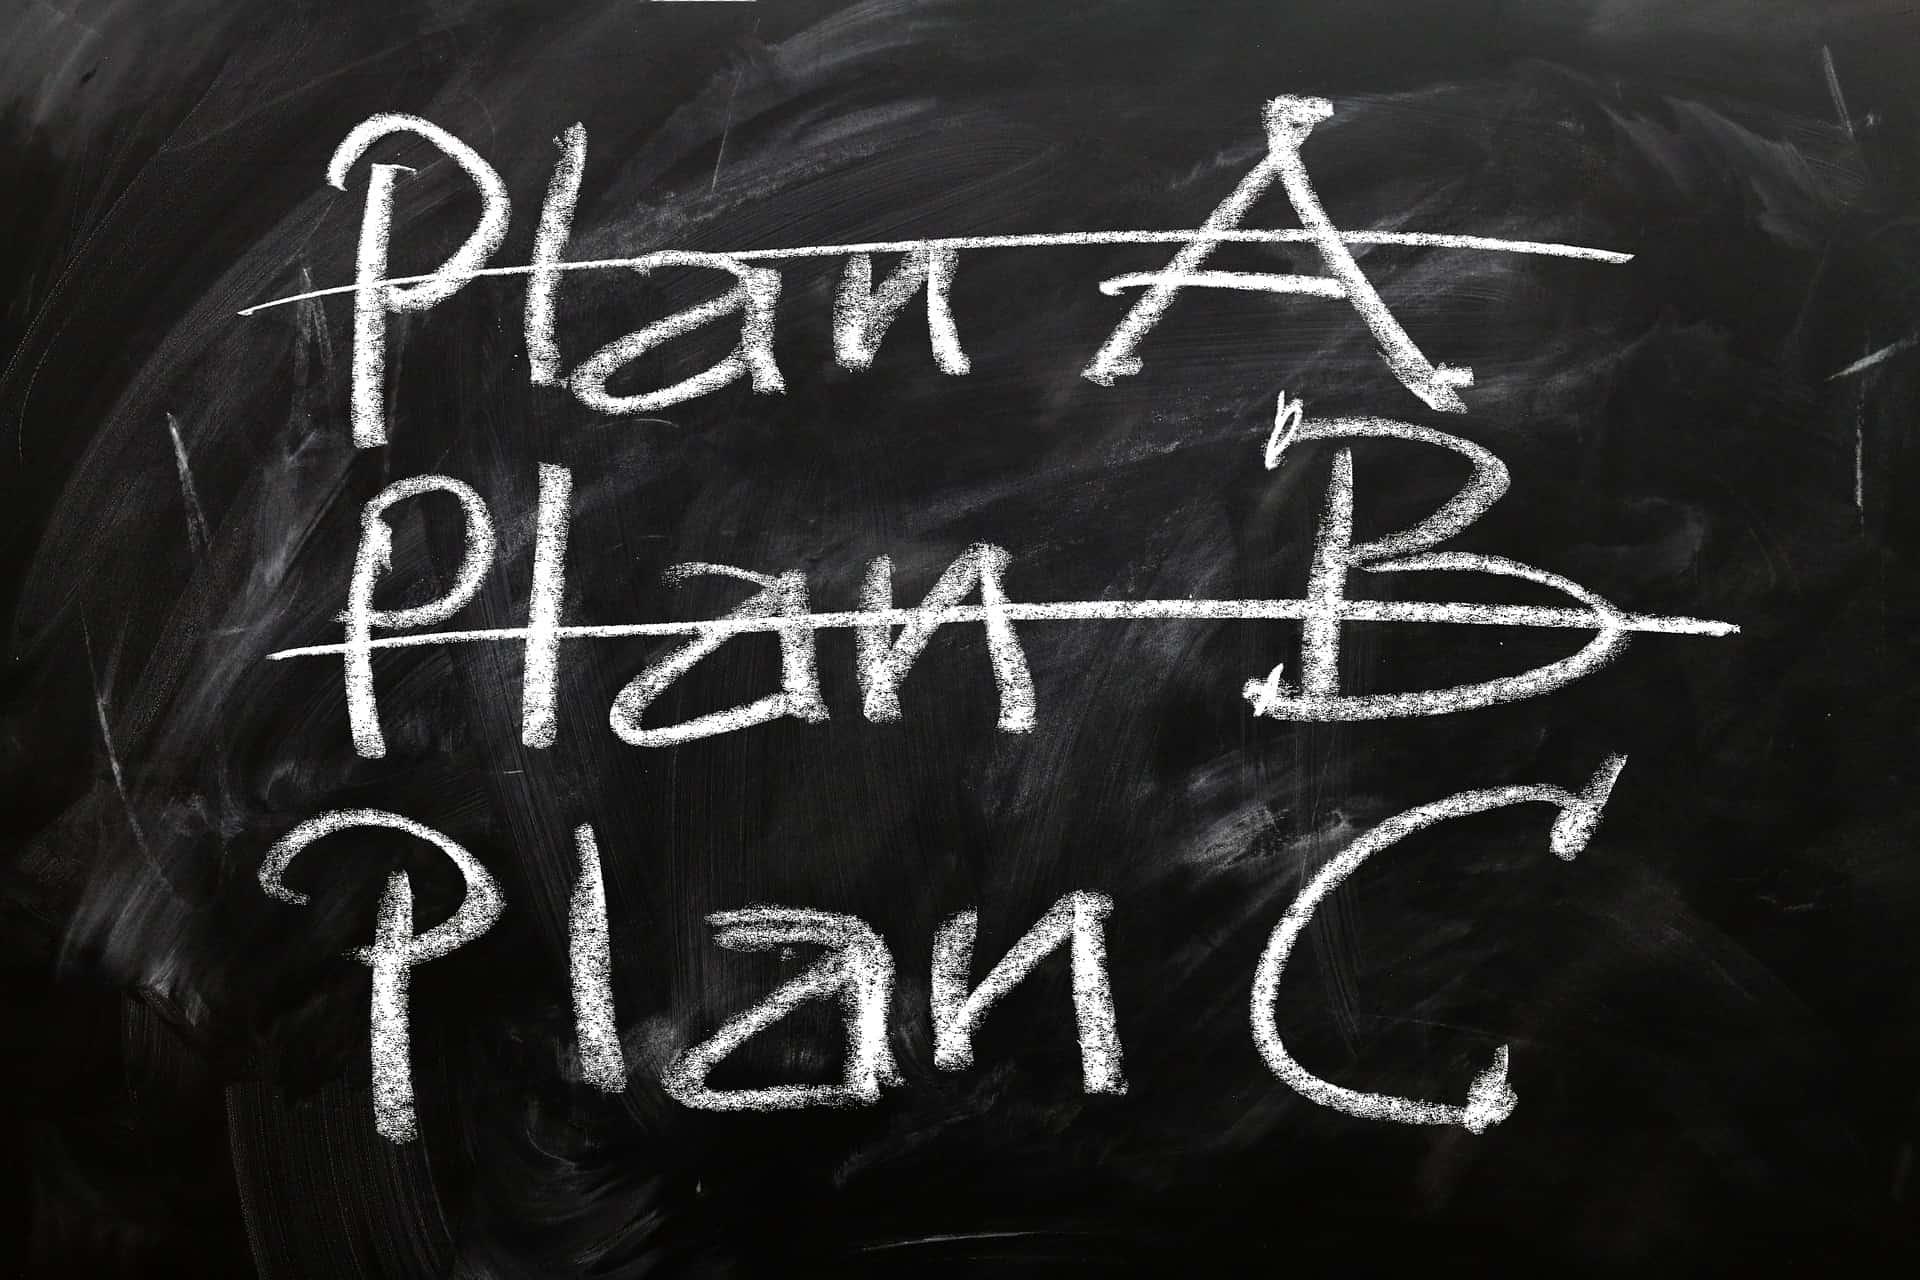 Plans de sauvegarde et de redressement